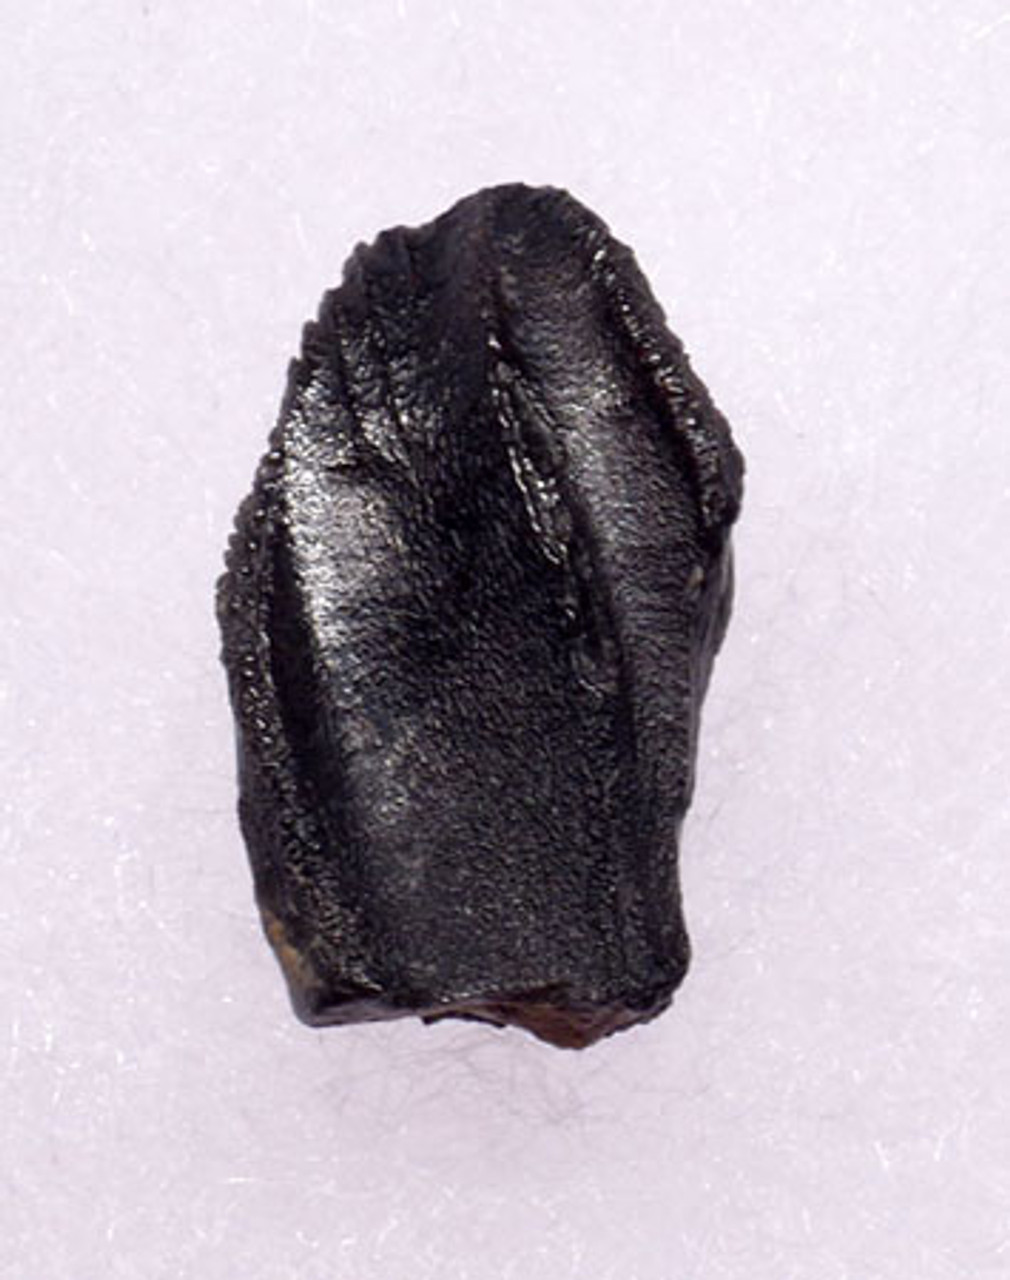 RARE FINE GRADE BRACHYLOPHOSAURUS HADROSAUR DINOSAUR TOOTH  *DT7-027